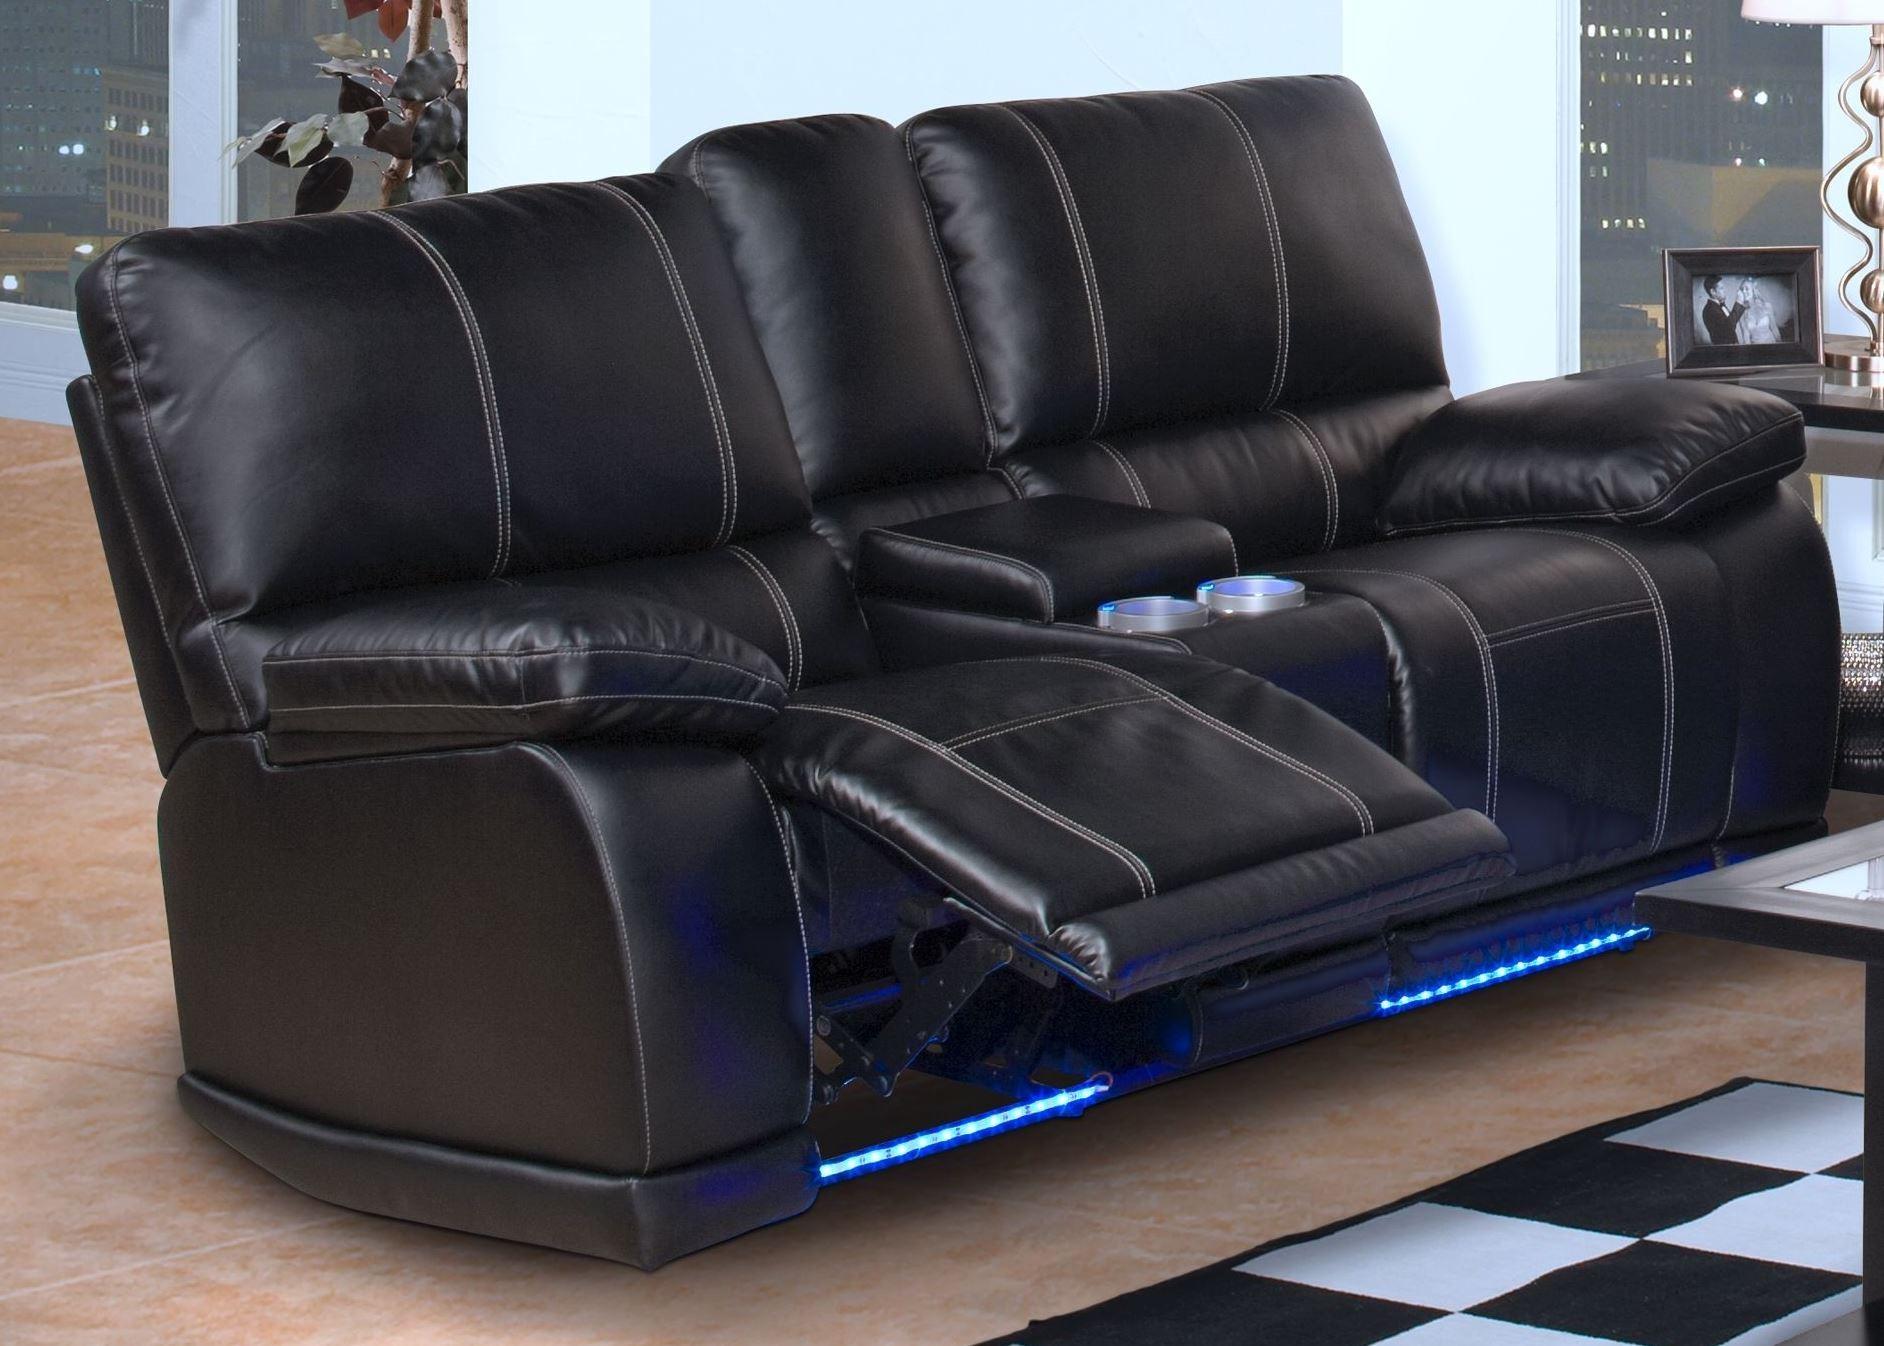 cobra dual reclining sofa reviews verona corner dining set electra mesa black loveseat with console